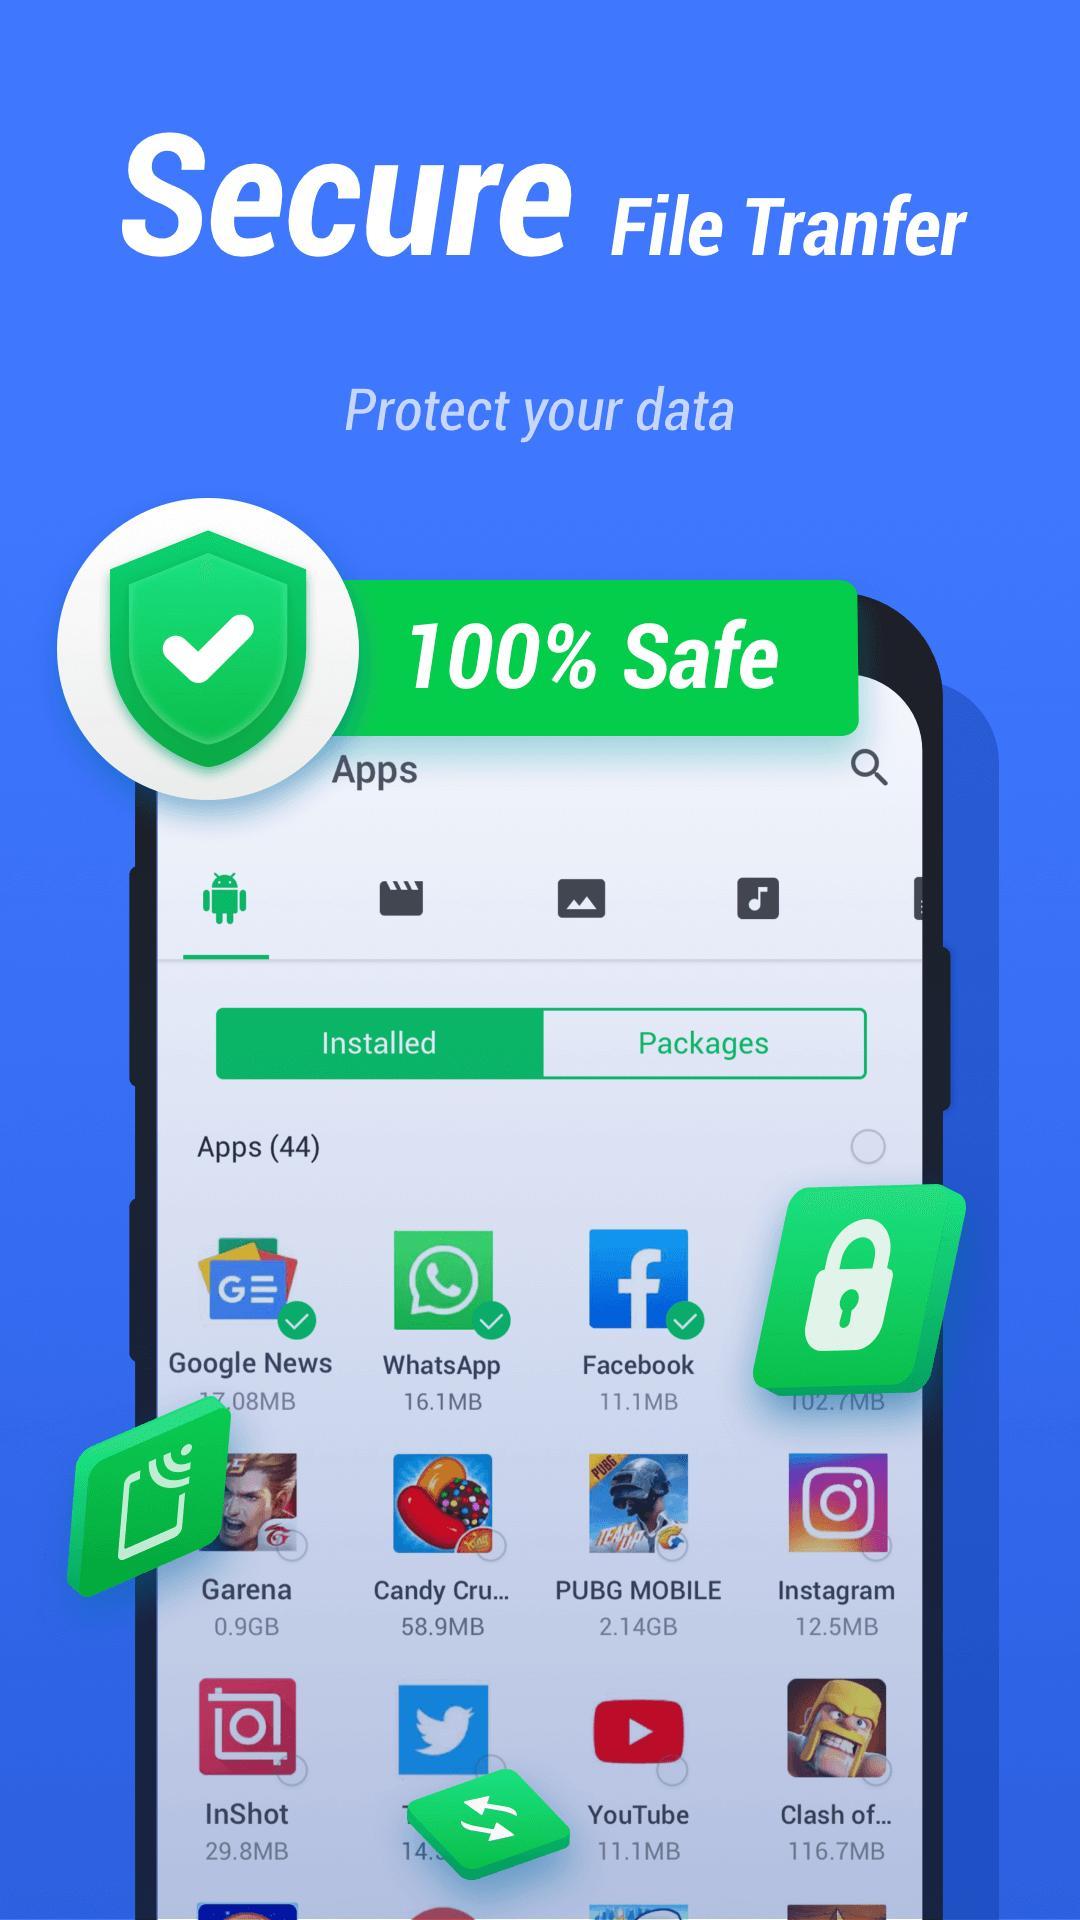 InShare Share Apps & File Transfer 1.2.1.4 Screenshot 3